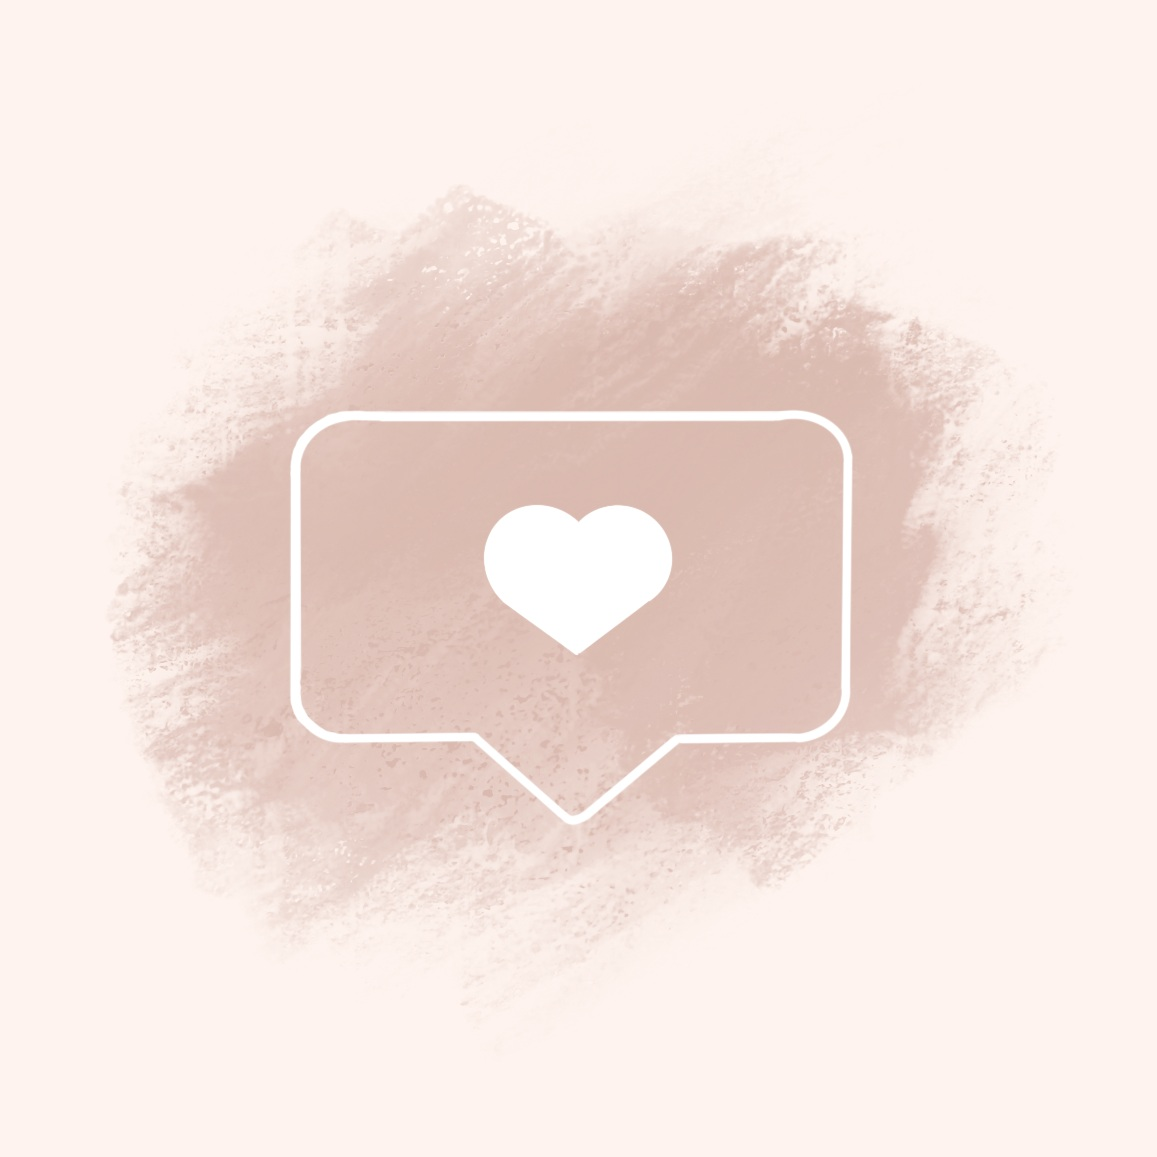 Client+Love.jpg